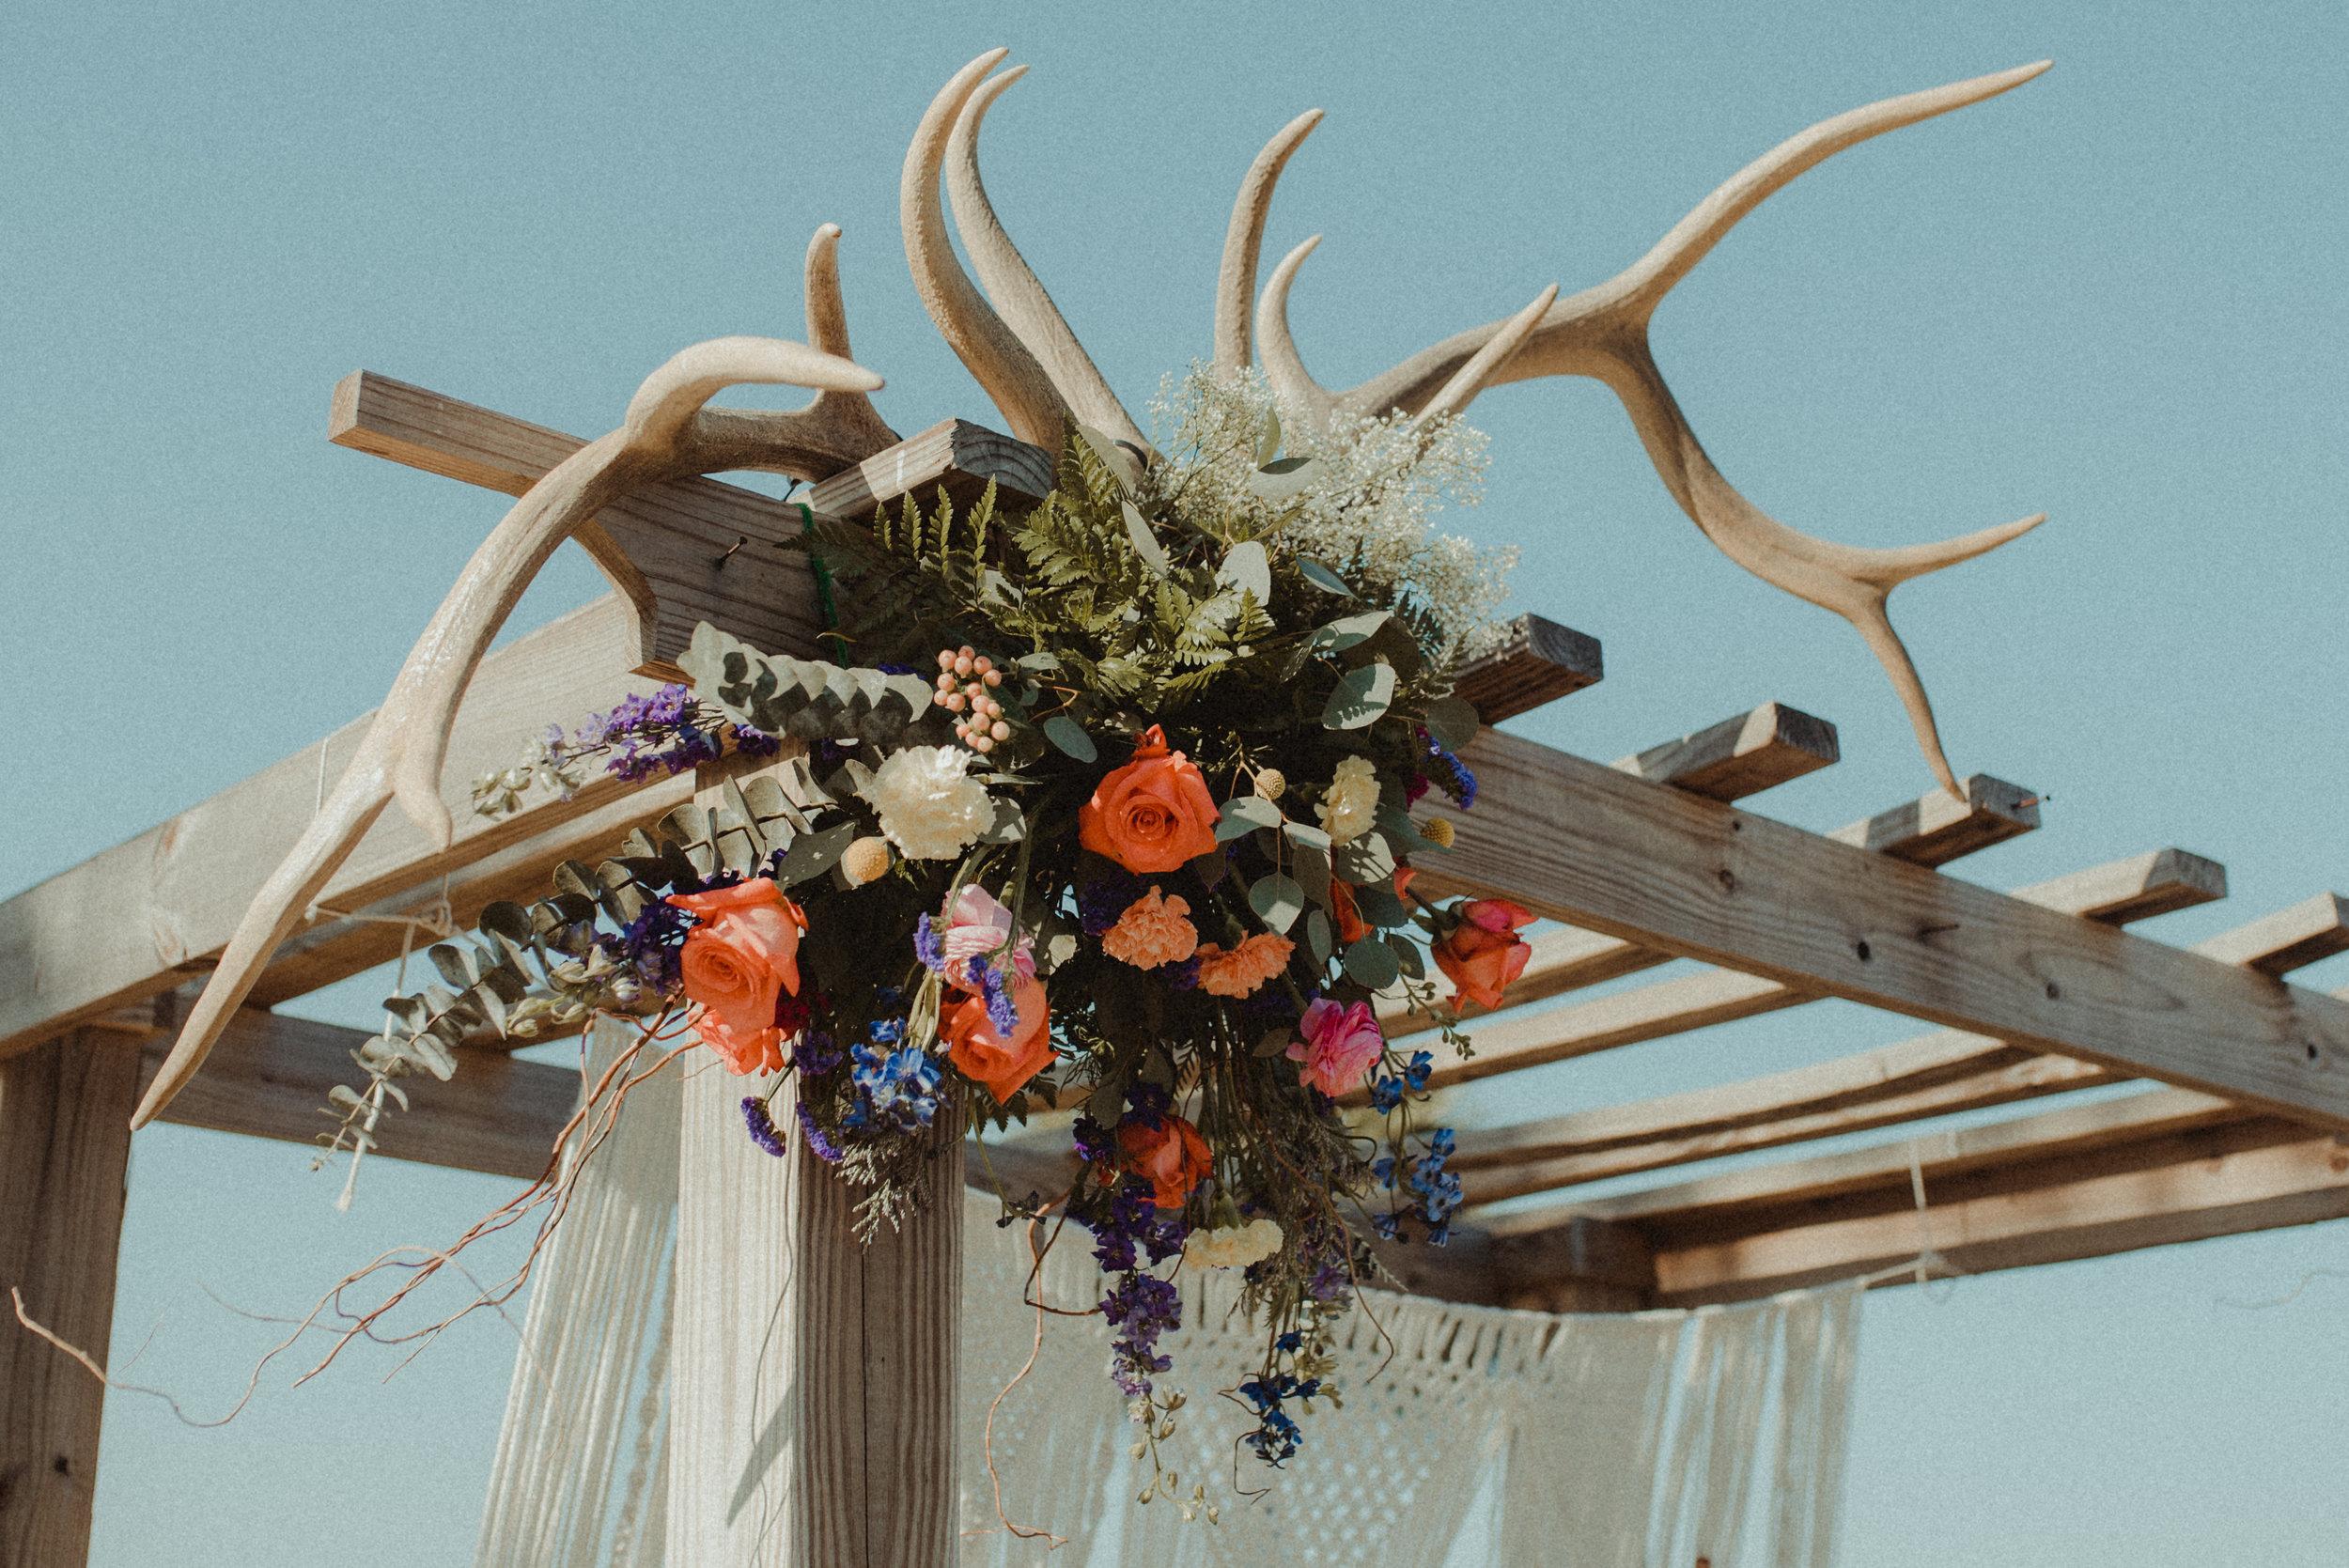 zayda-collin-panama-city-wedding-photography-trippy-bohemian-lisa-frank-wedding-venue-30.jpg